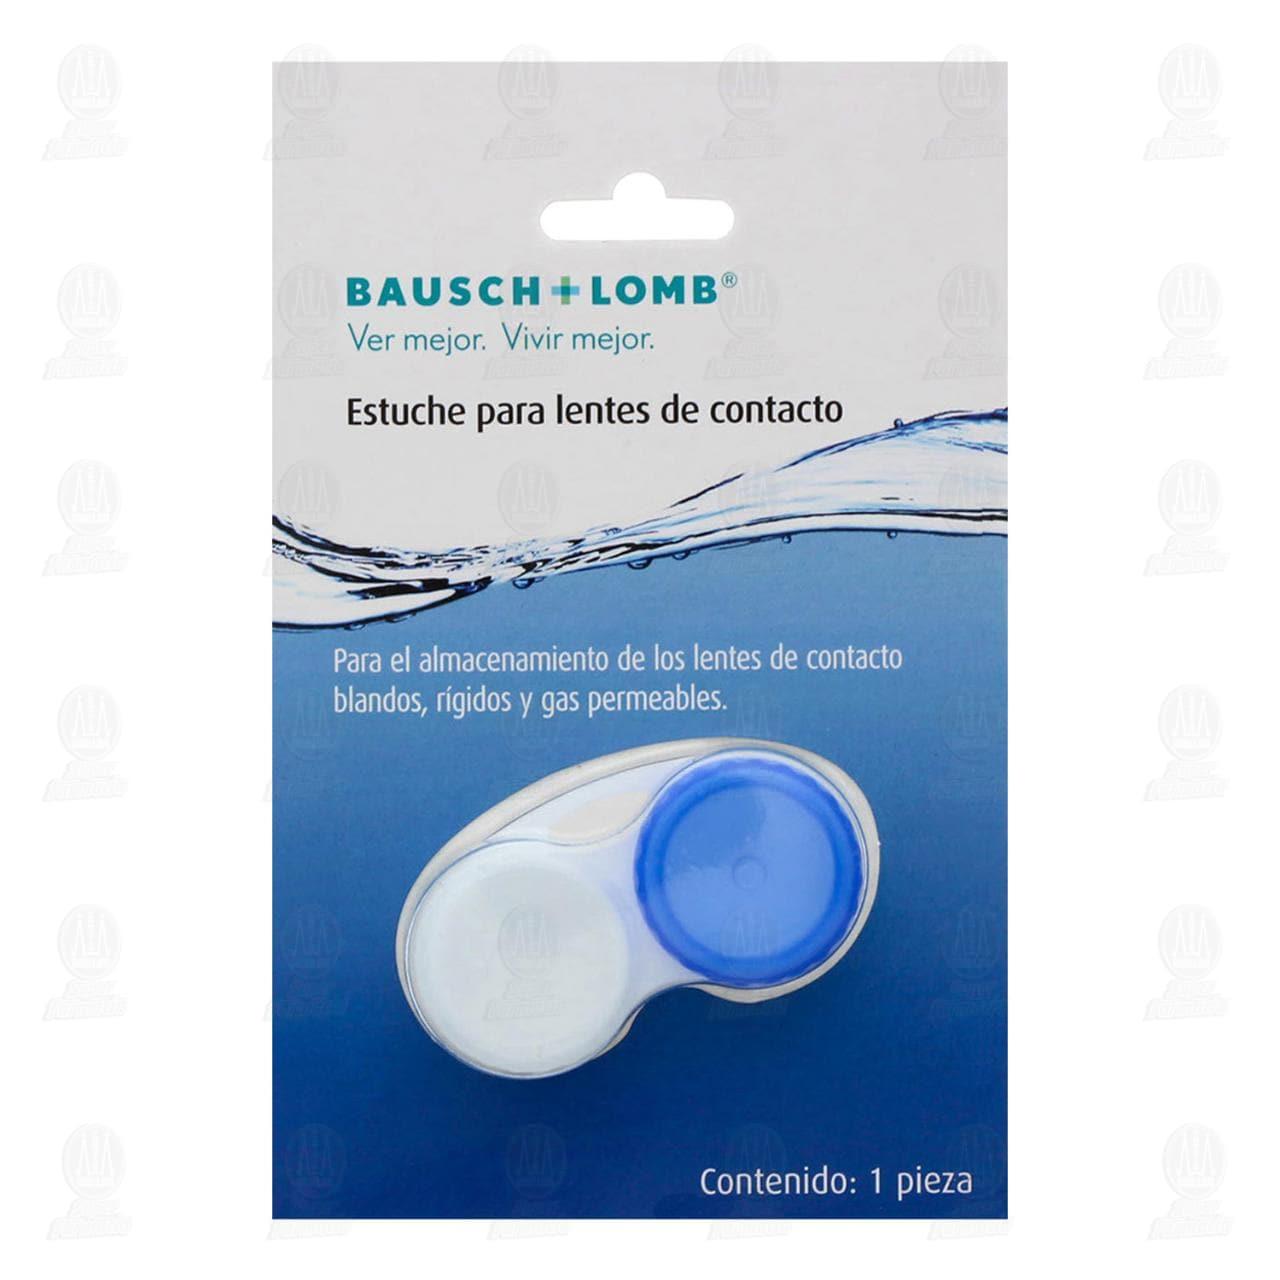 Comprar Renu Estuche Lentes de Contacto, 1pz. en Farmacias Guadalajara